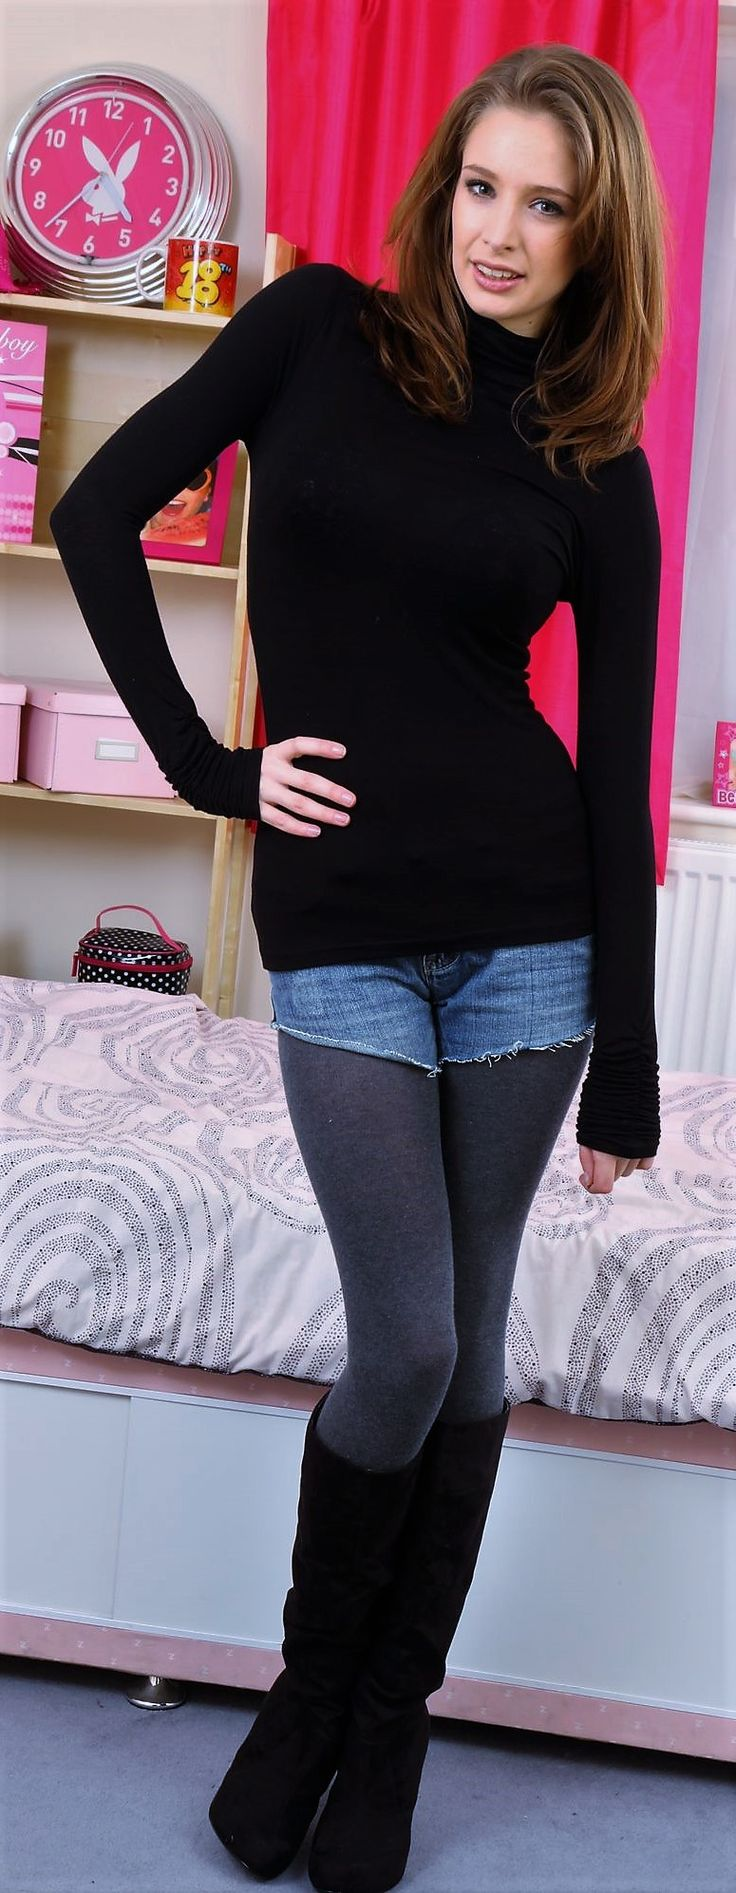 Emily Shaw | Emily, Skinny jeans, Agnes